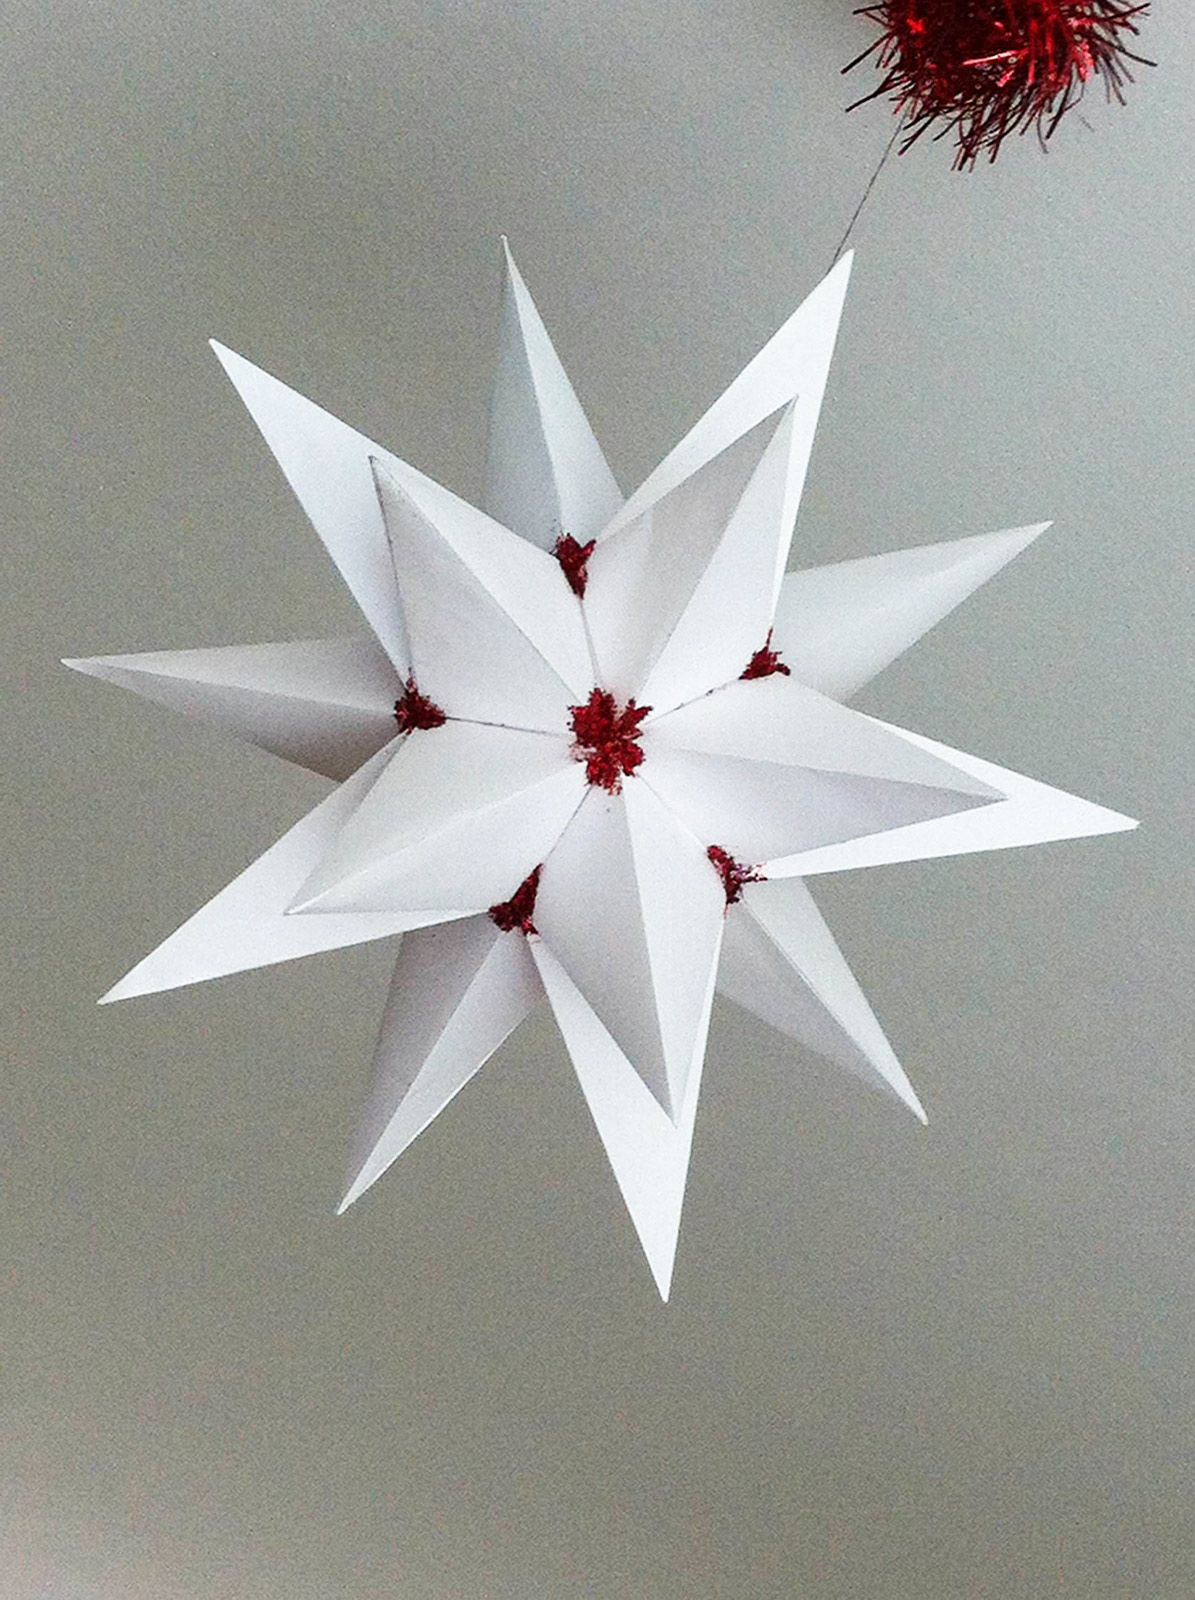 Origami Stella Di Natale.Origami Stelle Per Natale Cose Di Casa Natale Stella Di Natale Idee Di Natale